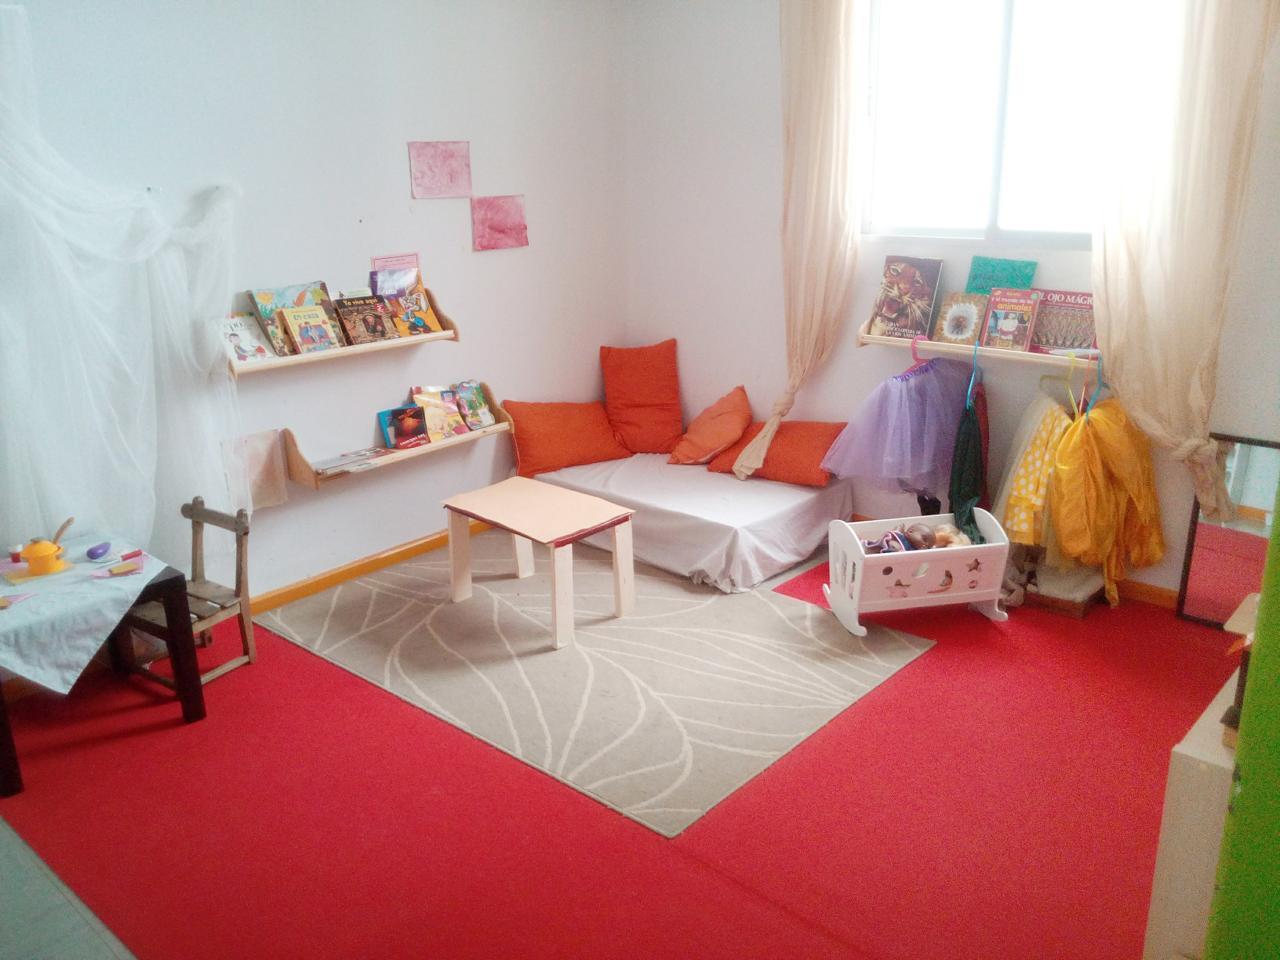 Piso en venta con 105 m2, 4 dormitorios  en Centro, Casco Antiguo (Các